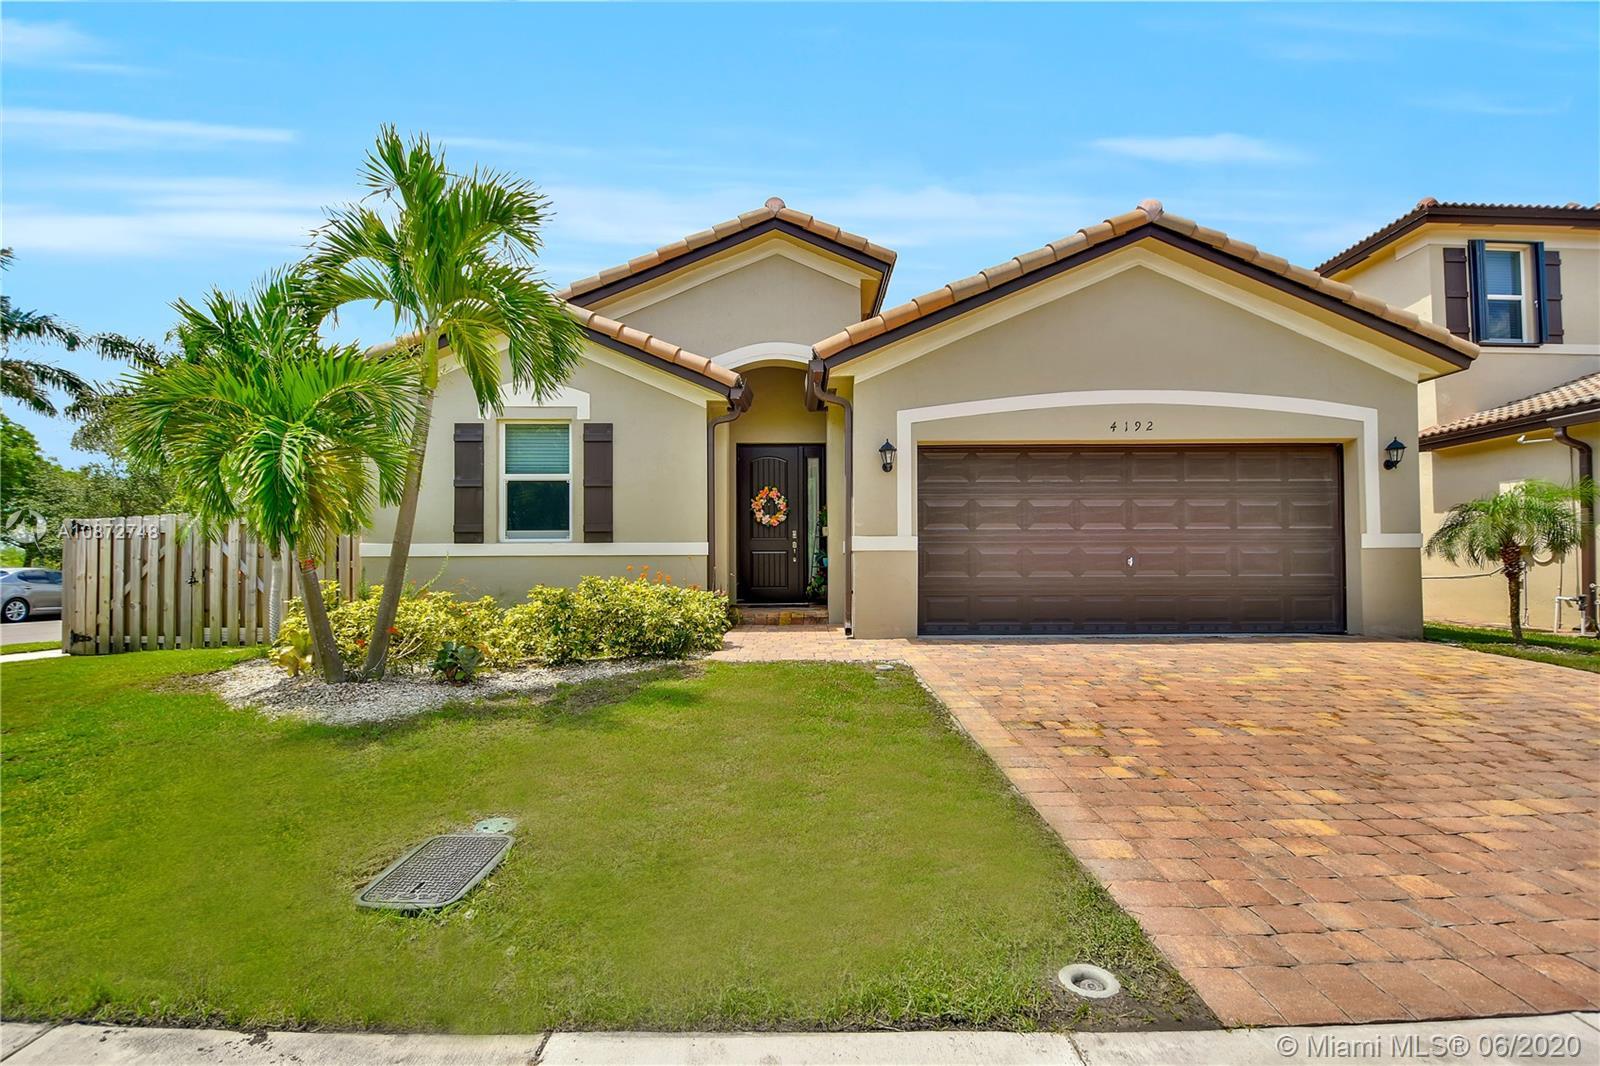 4192 NE 21st St Property Photo - Homestead, FL real estate listing